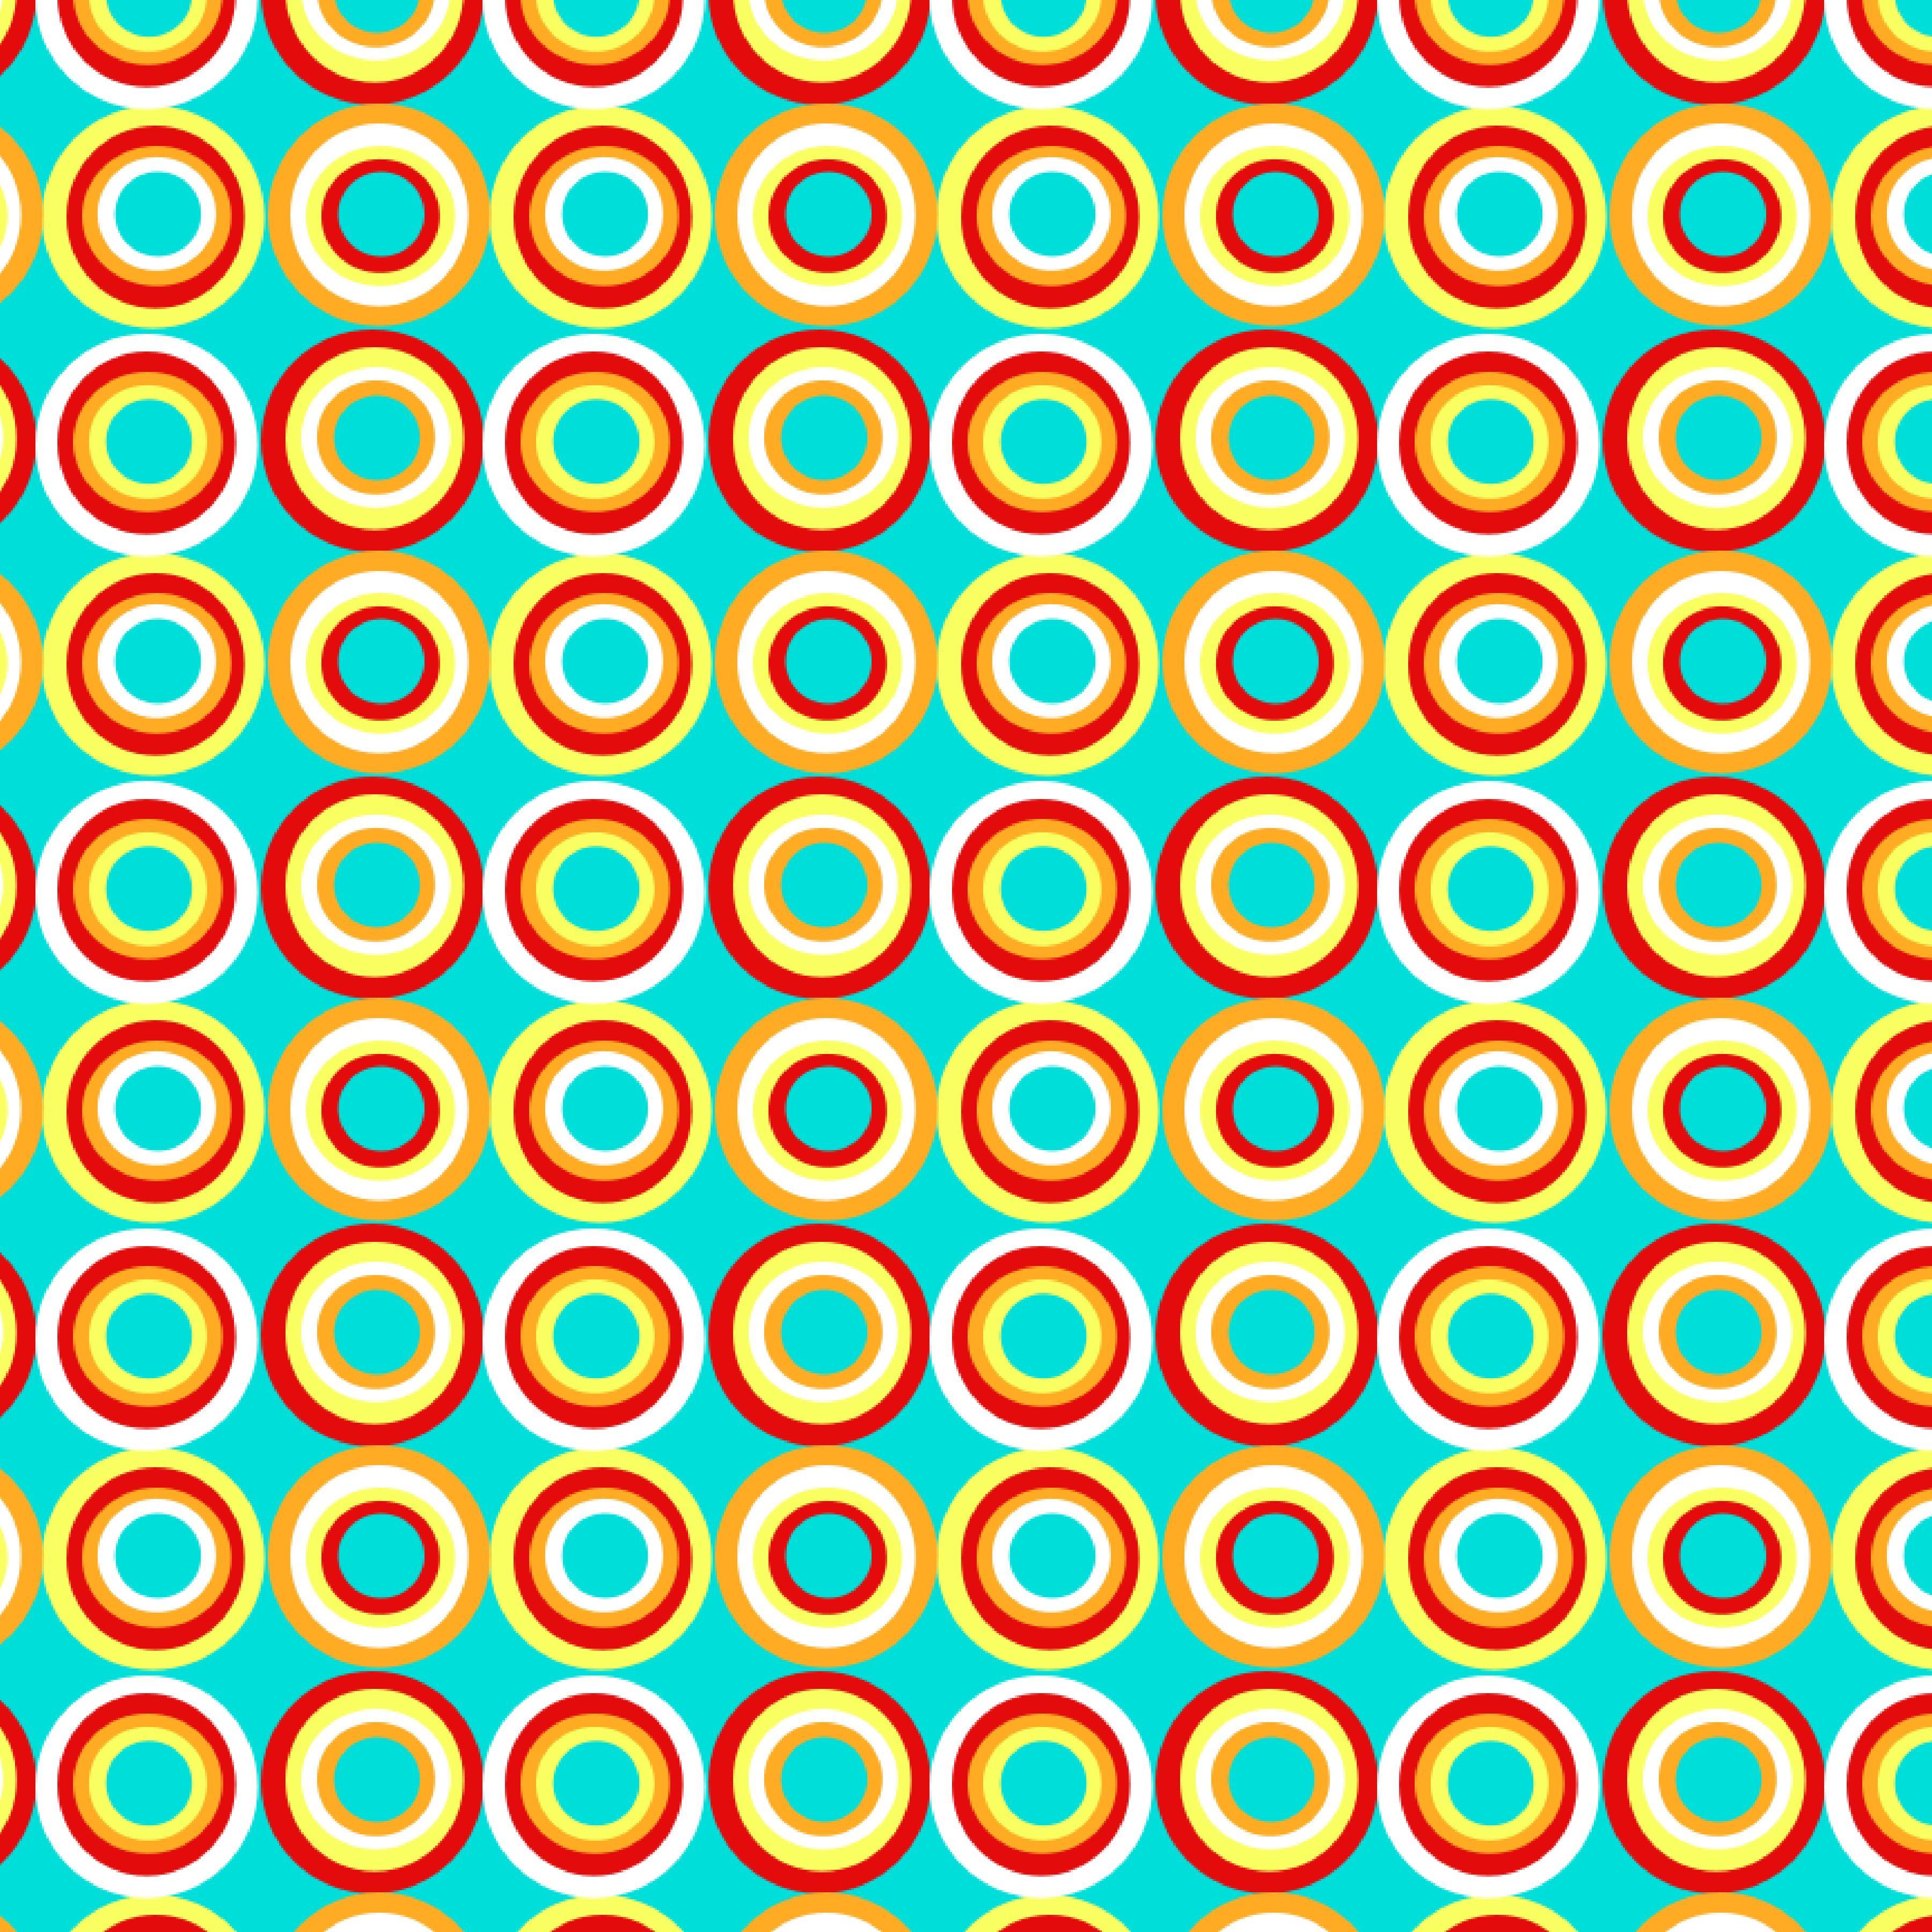 Scrapbook paper designs - 40 Paper Circus Act Jpg 3600 3600 Mickey Mouse Circus Pinterest Originals